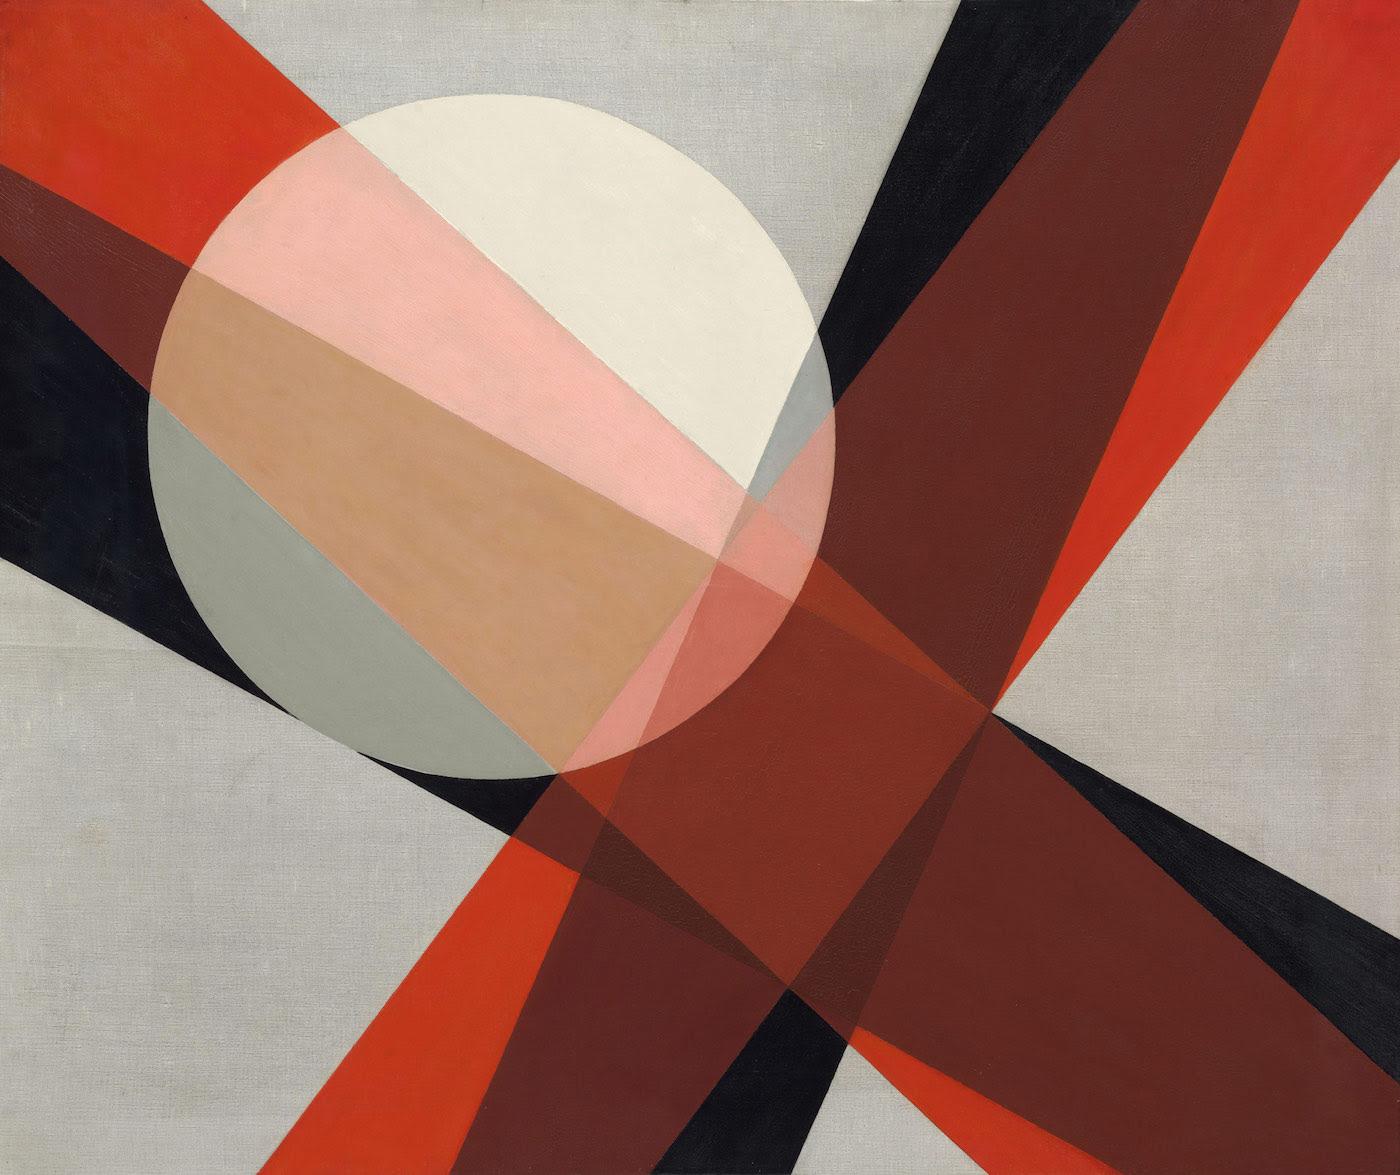 "László Moholy-Nagy, ""A 19"" (1927), oil and graphite on canvas, 80 × 95.5 cm (courtesy Hattula Moholy-Nagy, © 2016 Hattula Moholy-Nagy/VG Bild-Kunst, Bonn/Artists Rights Society (ARS), New York)"